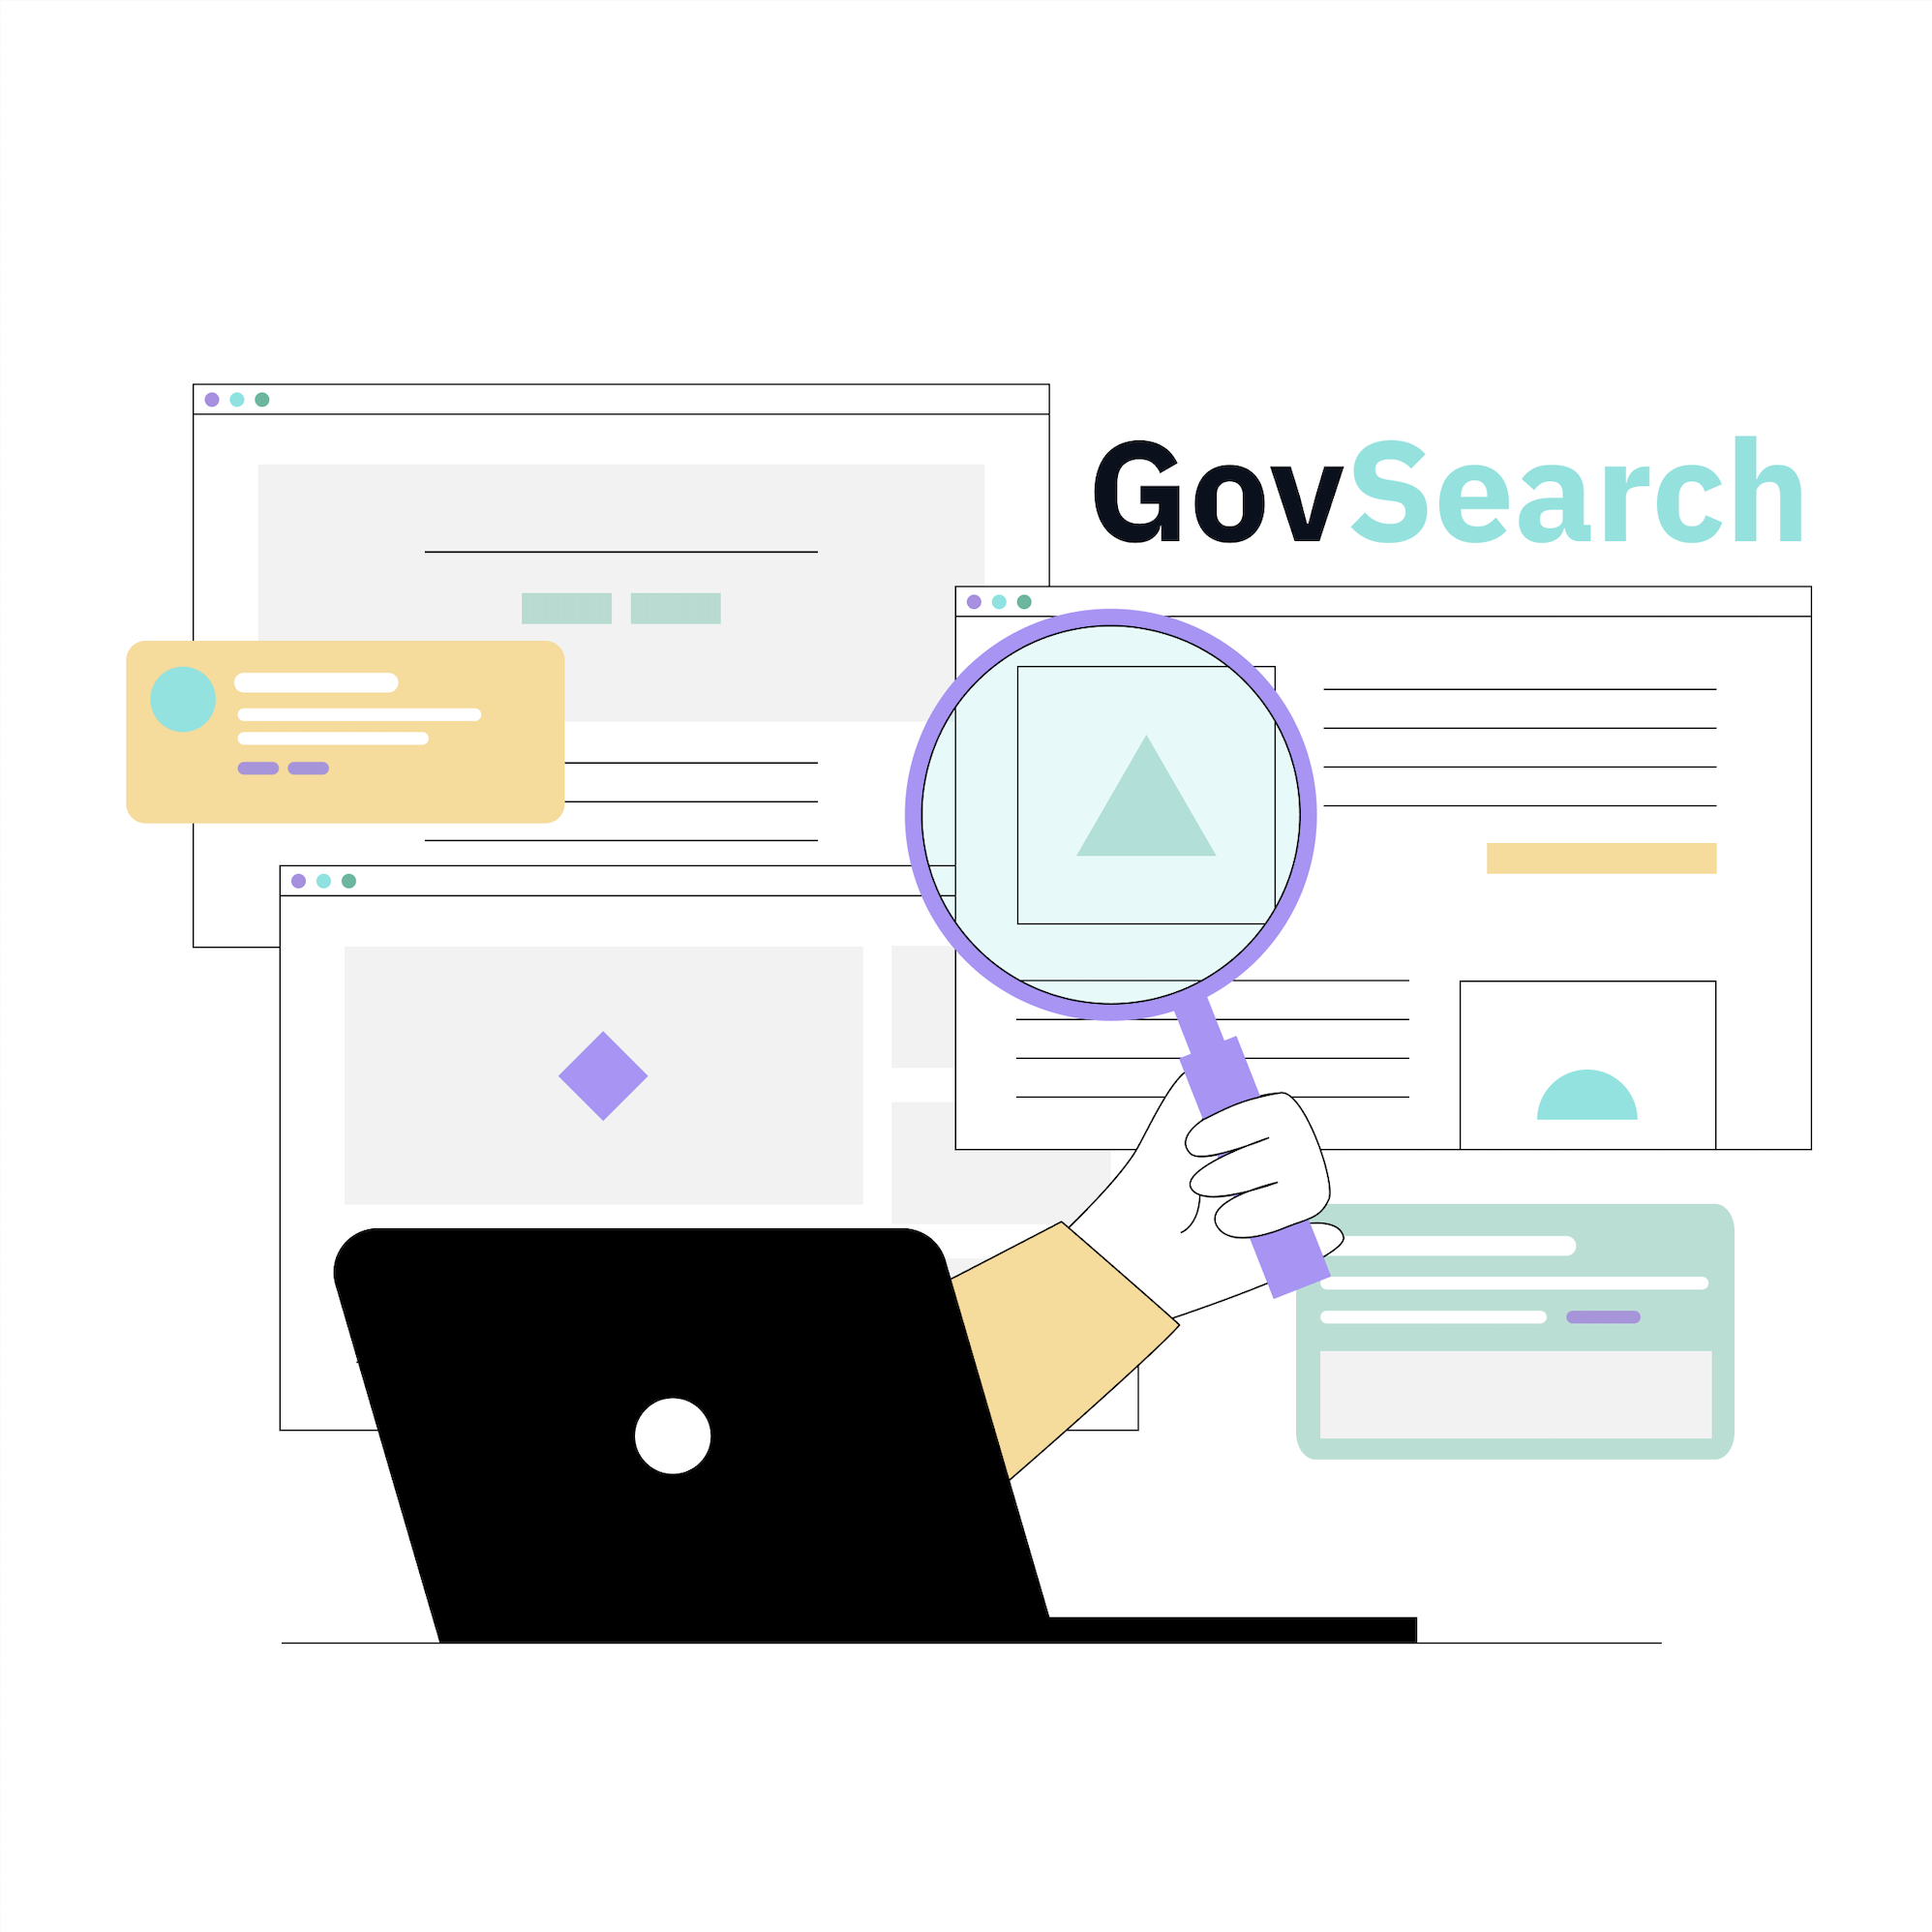 GovSearch